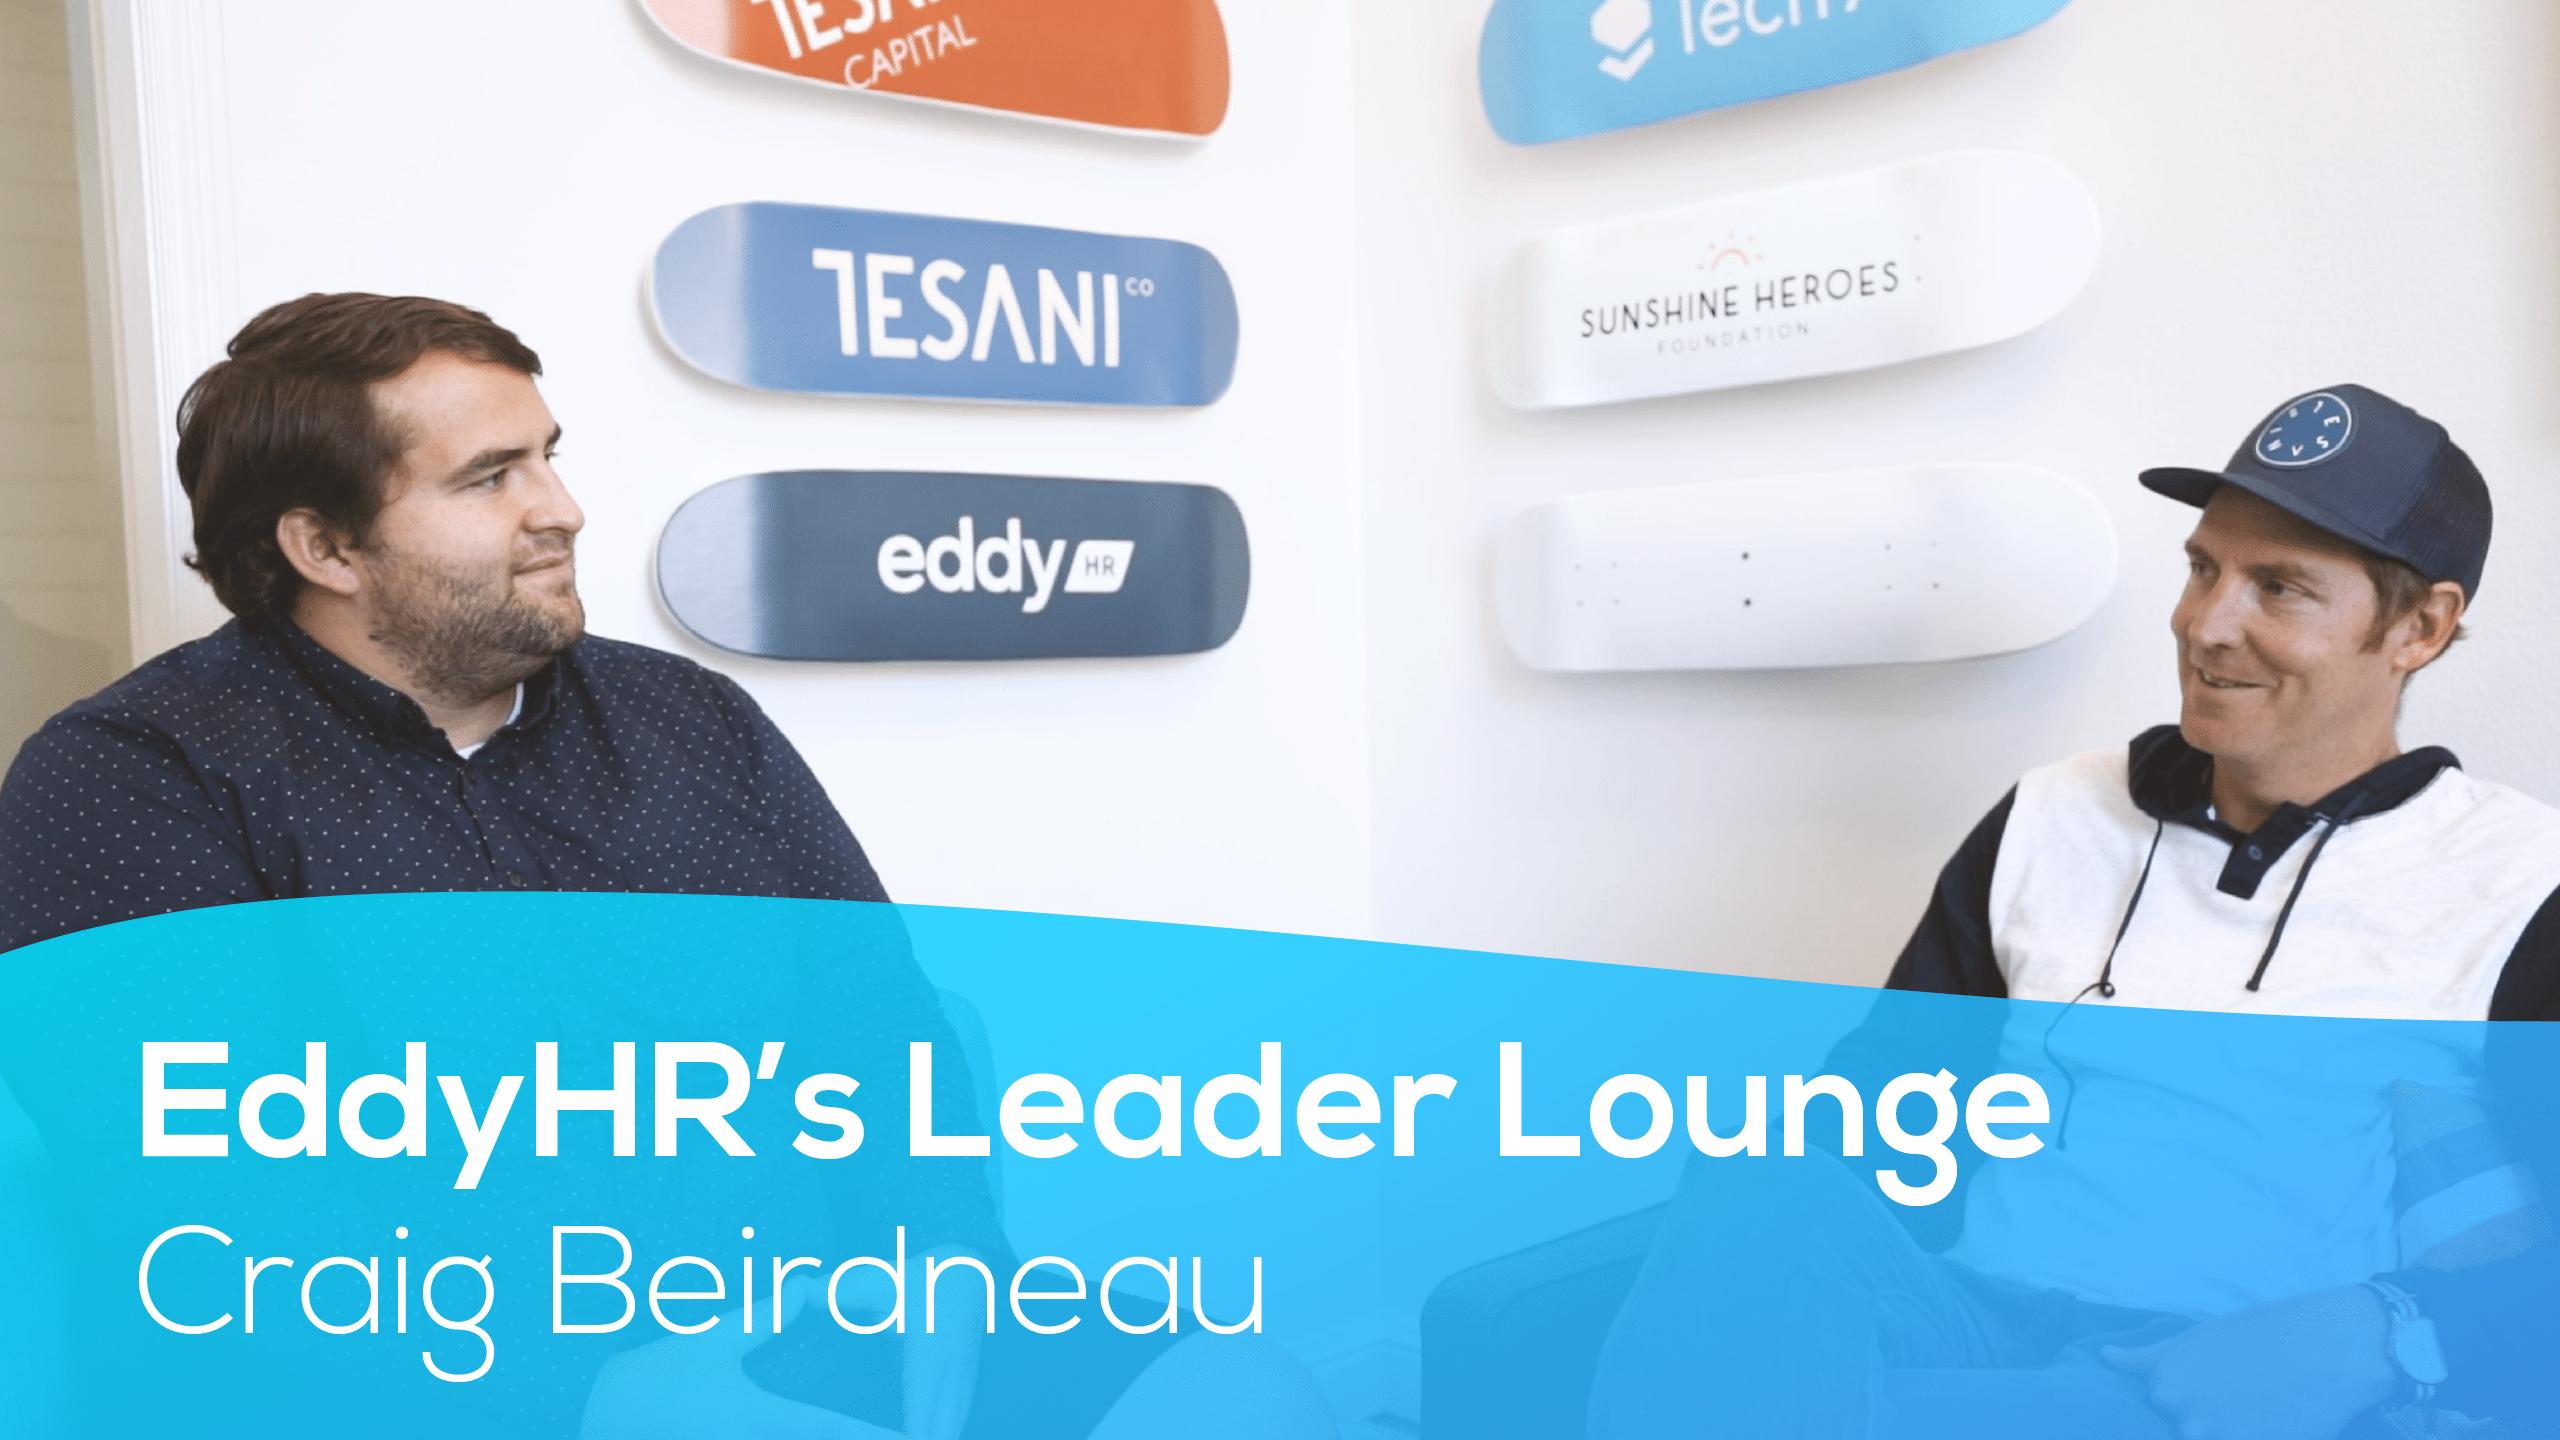 Eddy's Leader Lounge With Craig Beirdneau